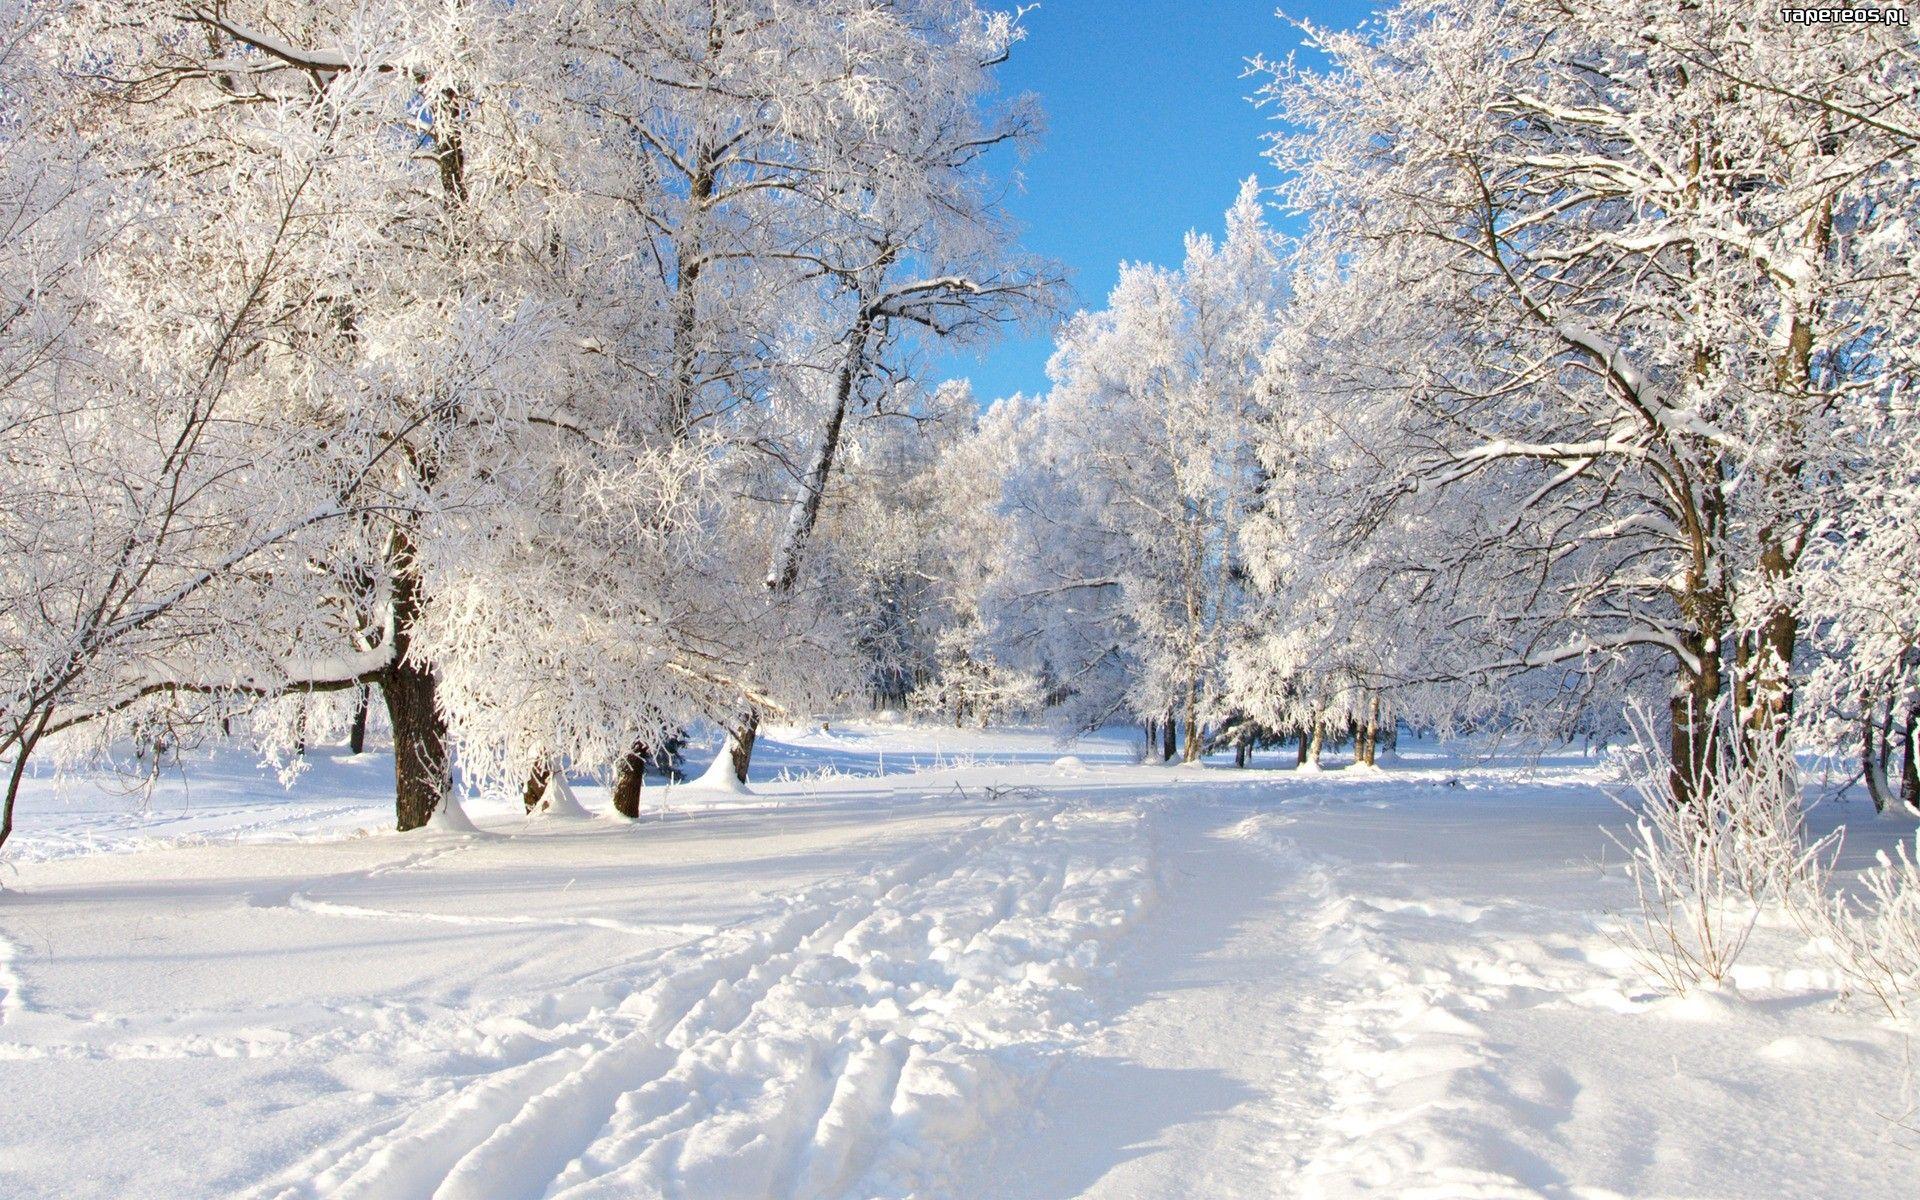 снег ели зима snow ate winter загрузить